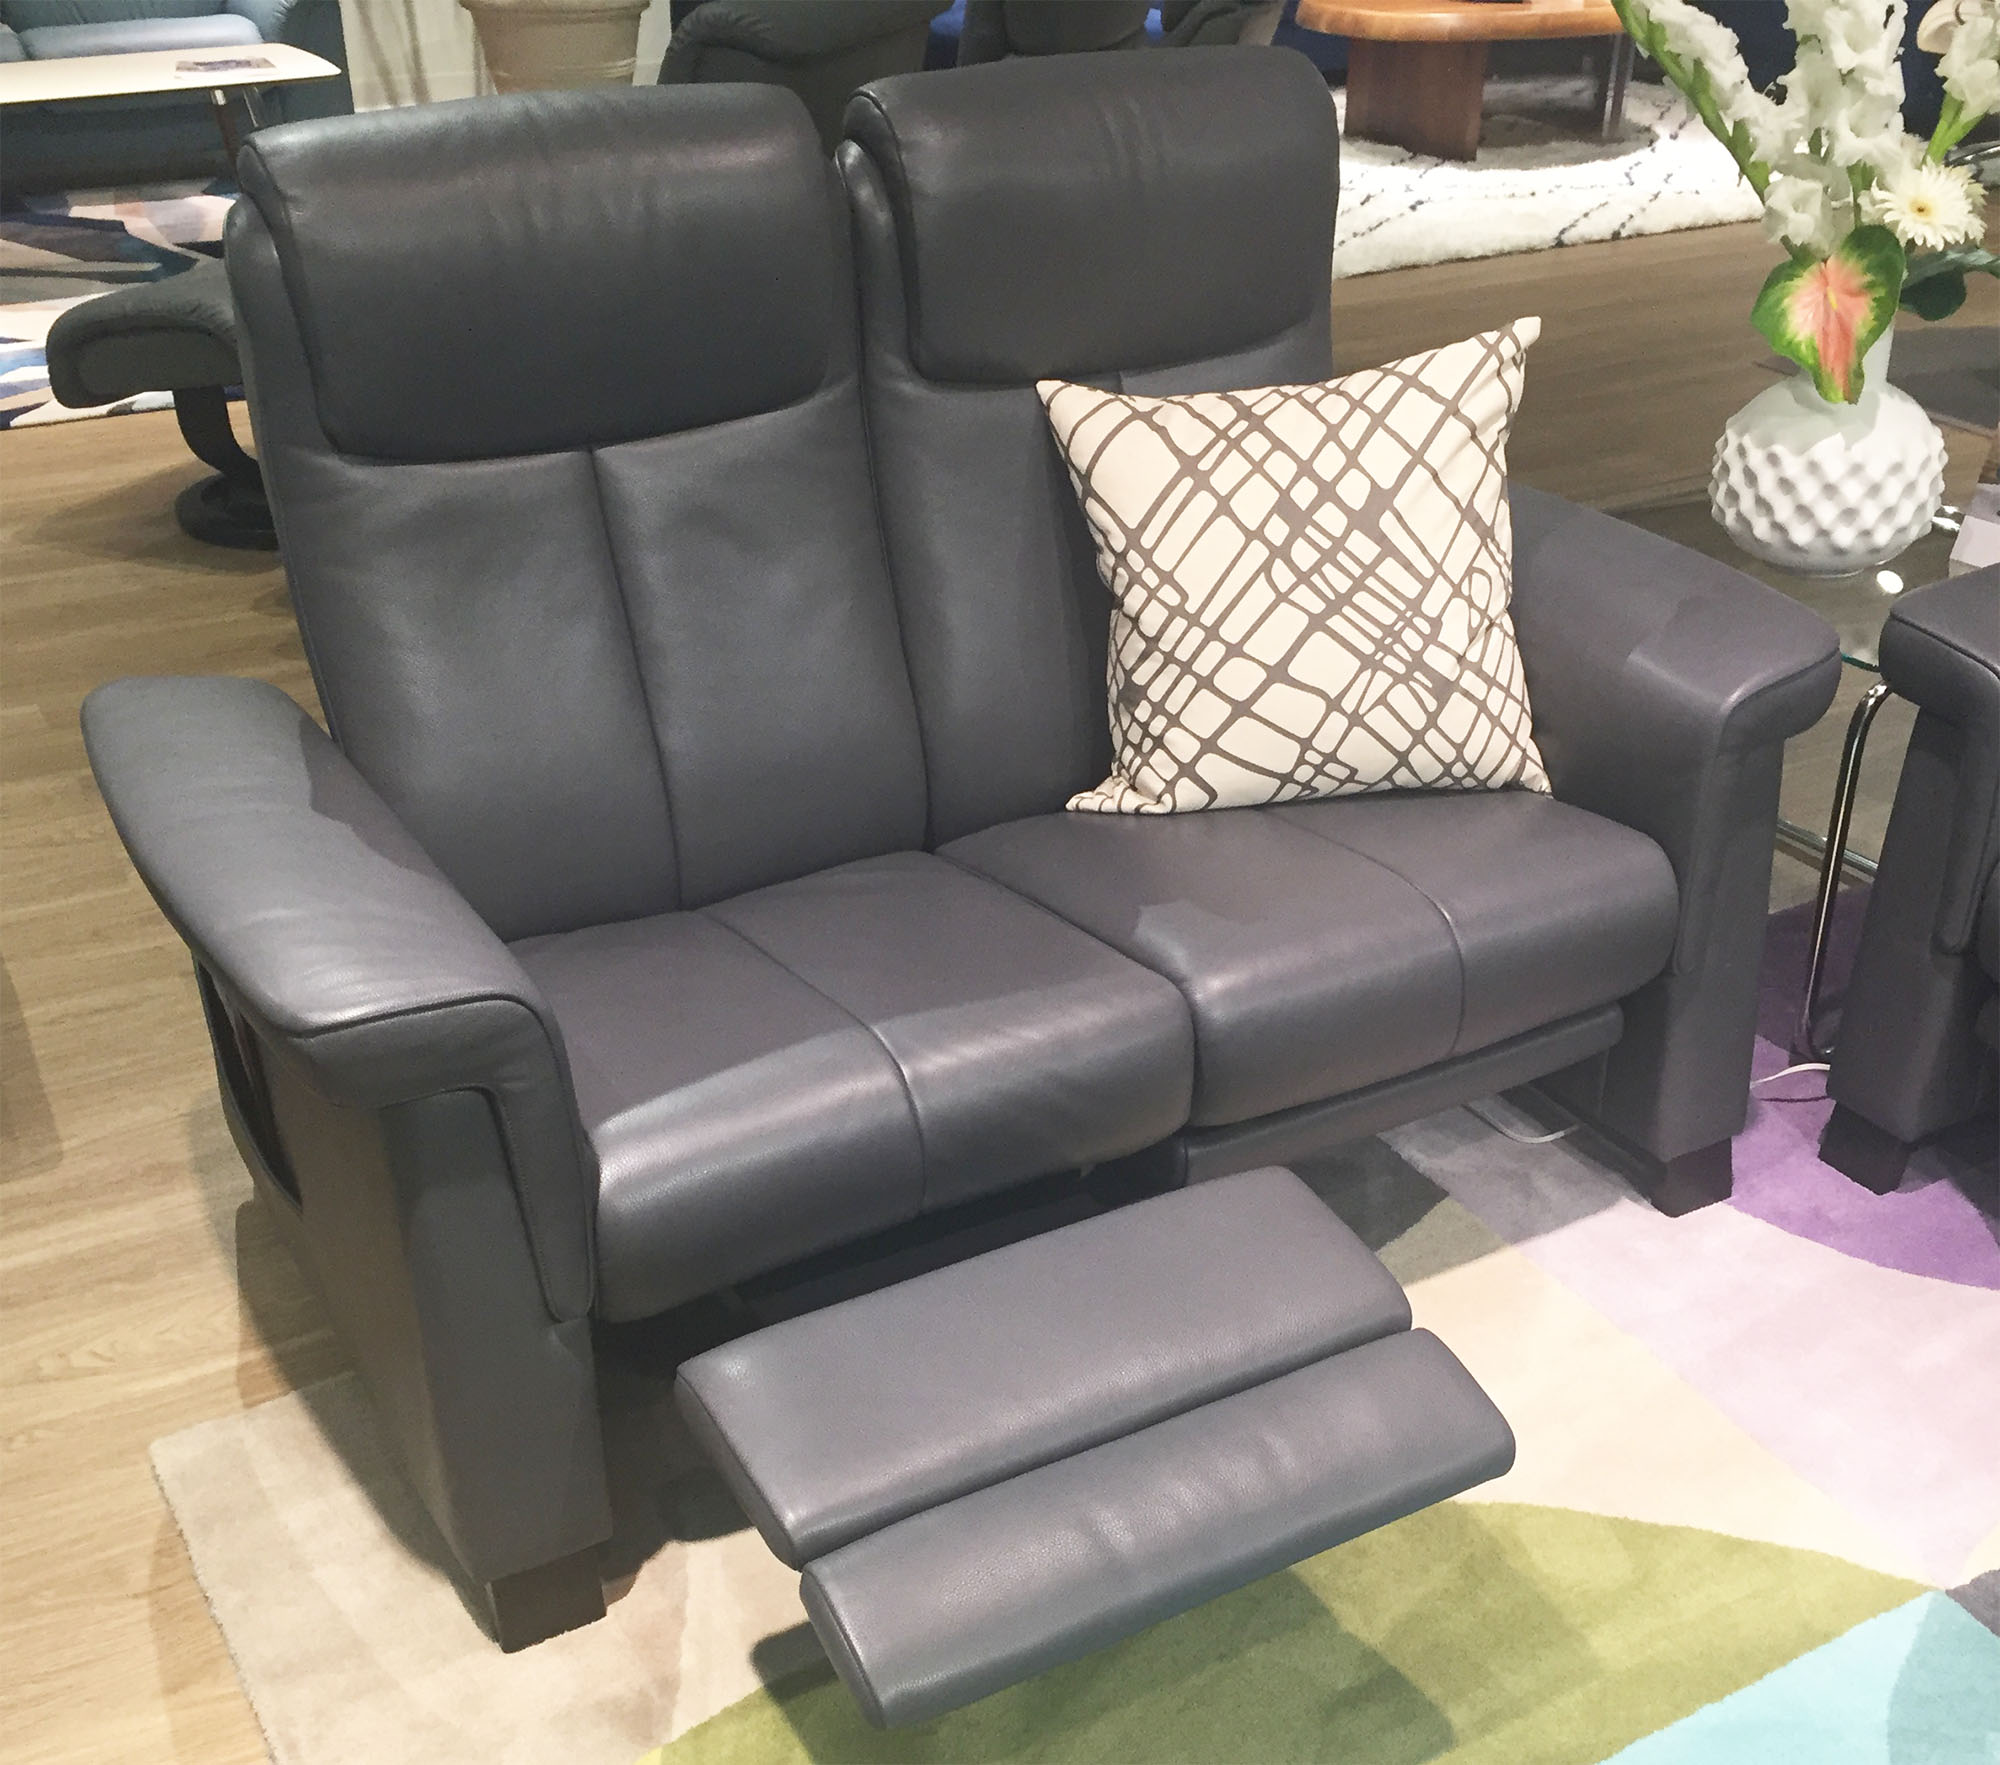 Stressless LegComfort Recliner Chair and Ottoman Videos by Ekornes